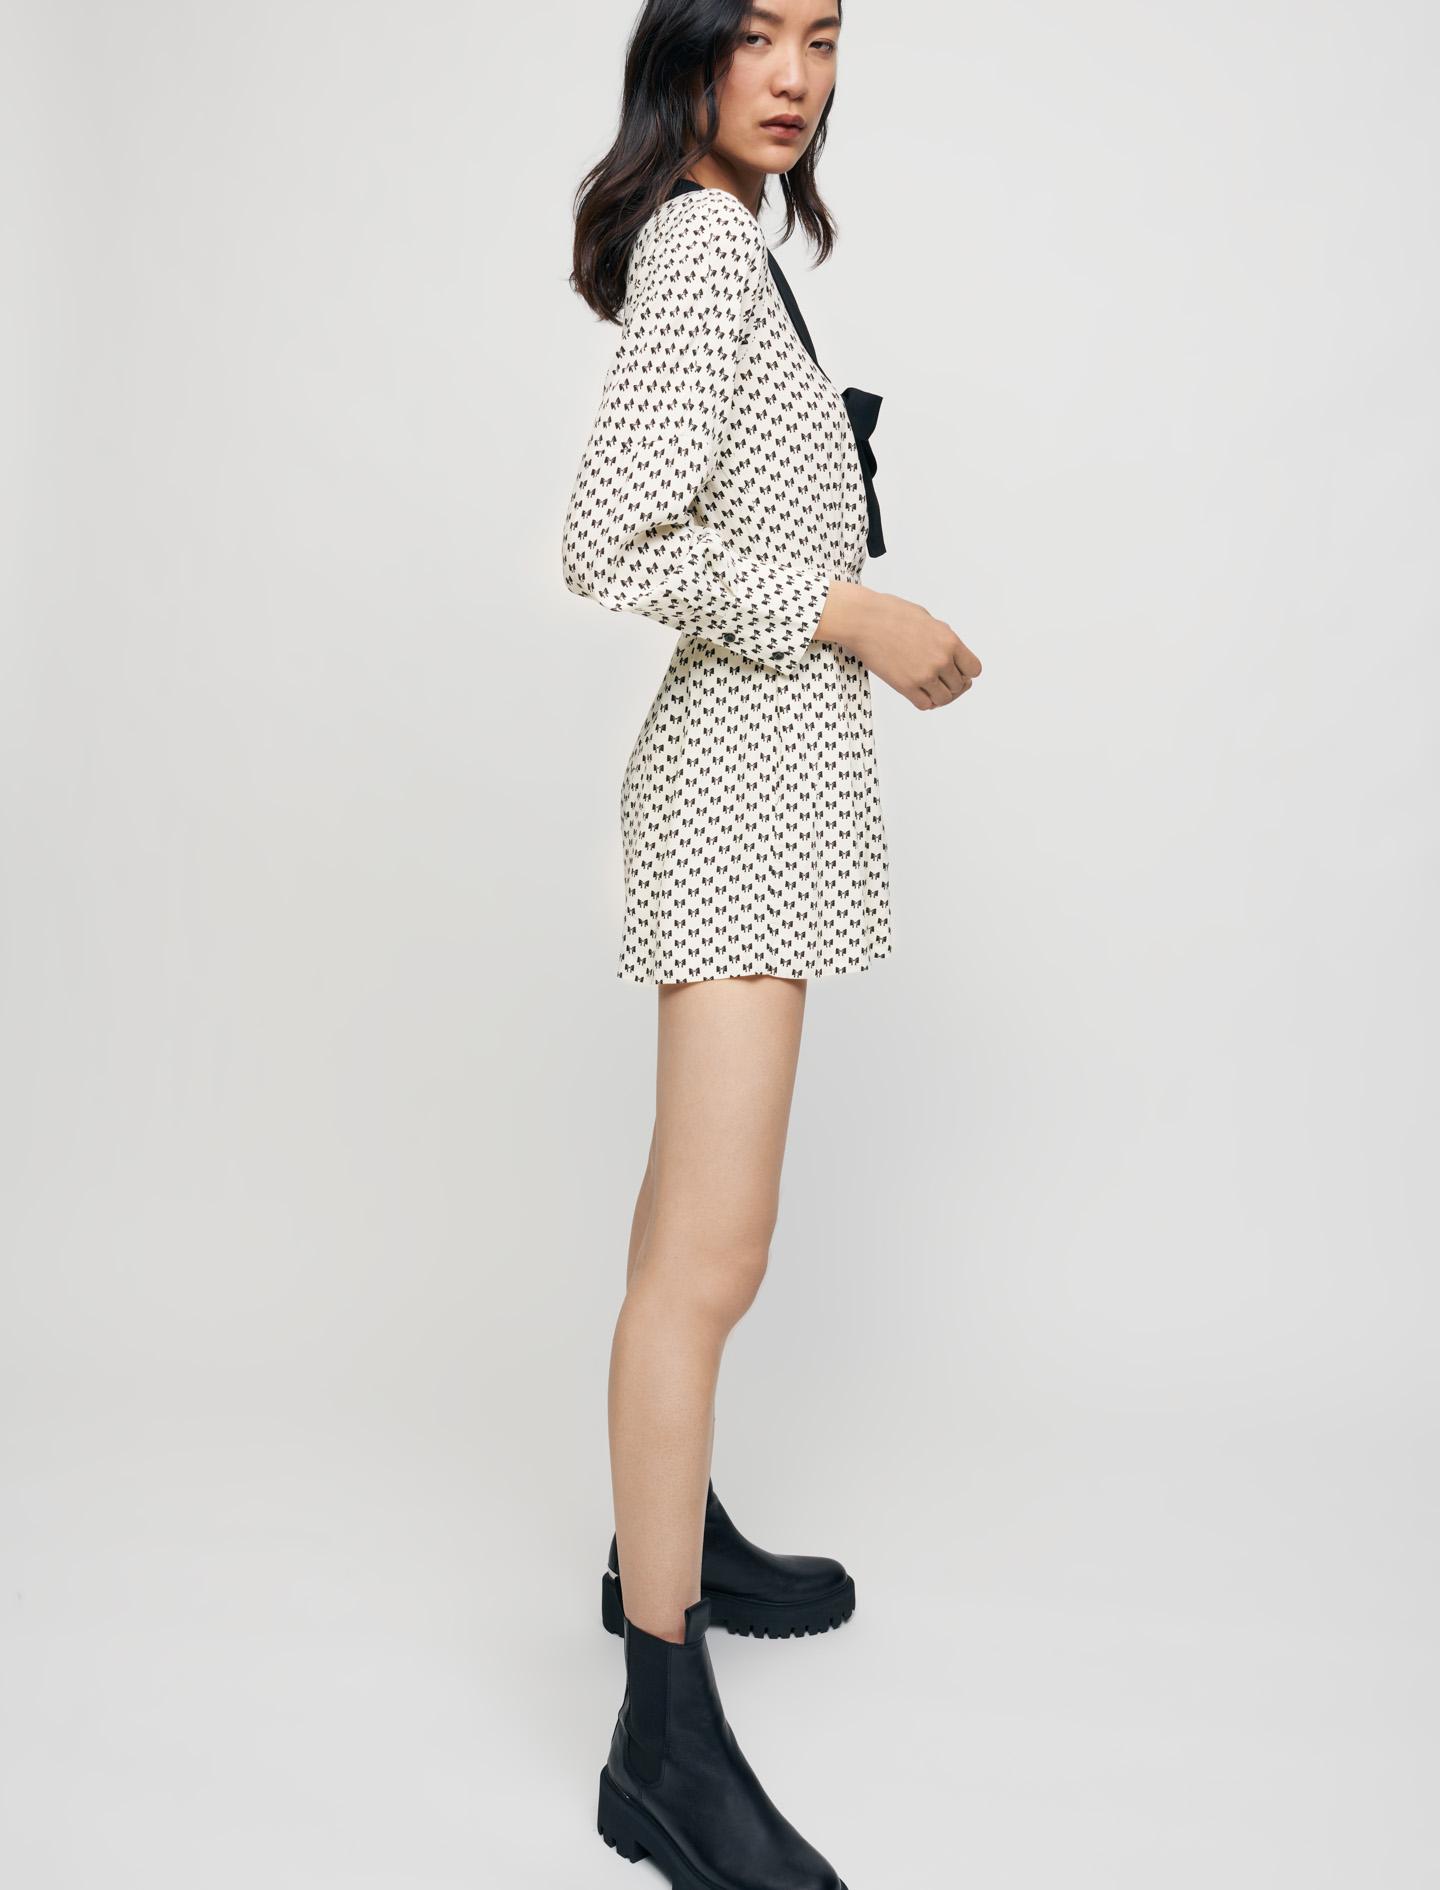 Bow print playsuit - White